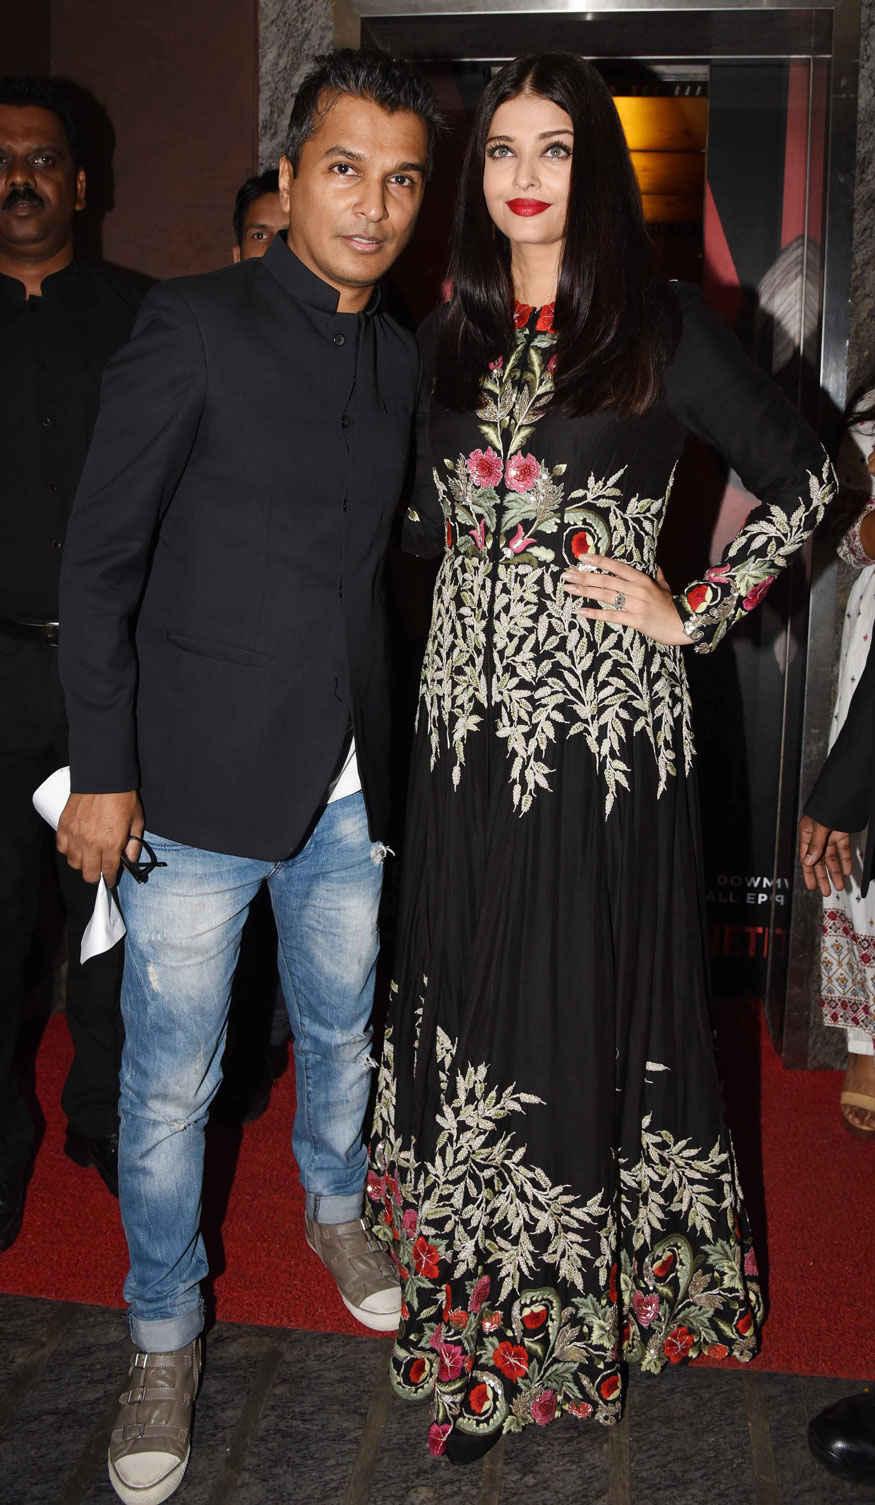 Aishwarya Rai Attends The Music Launch of Hrudayantar at PVR Premiere